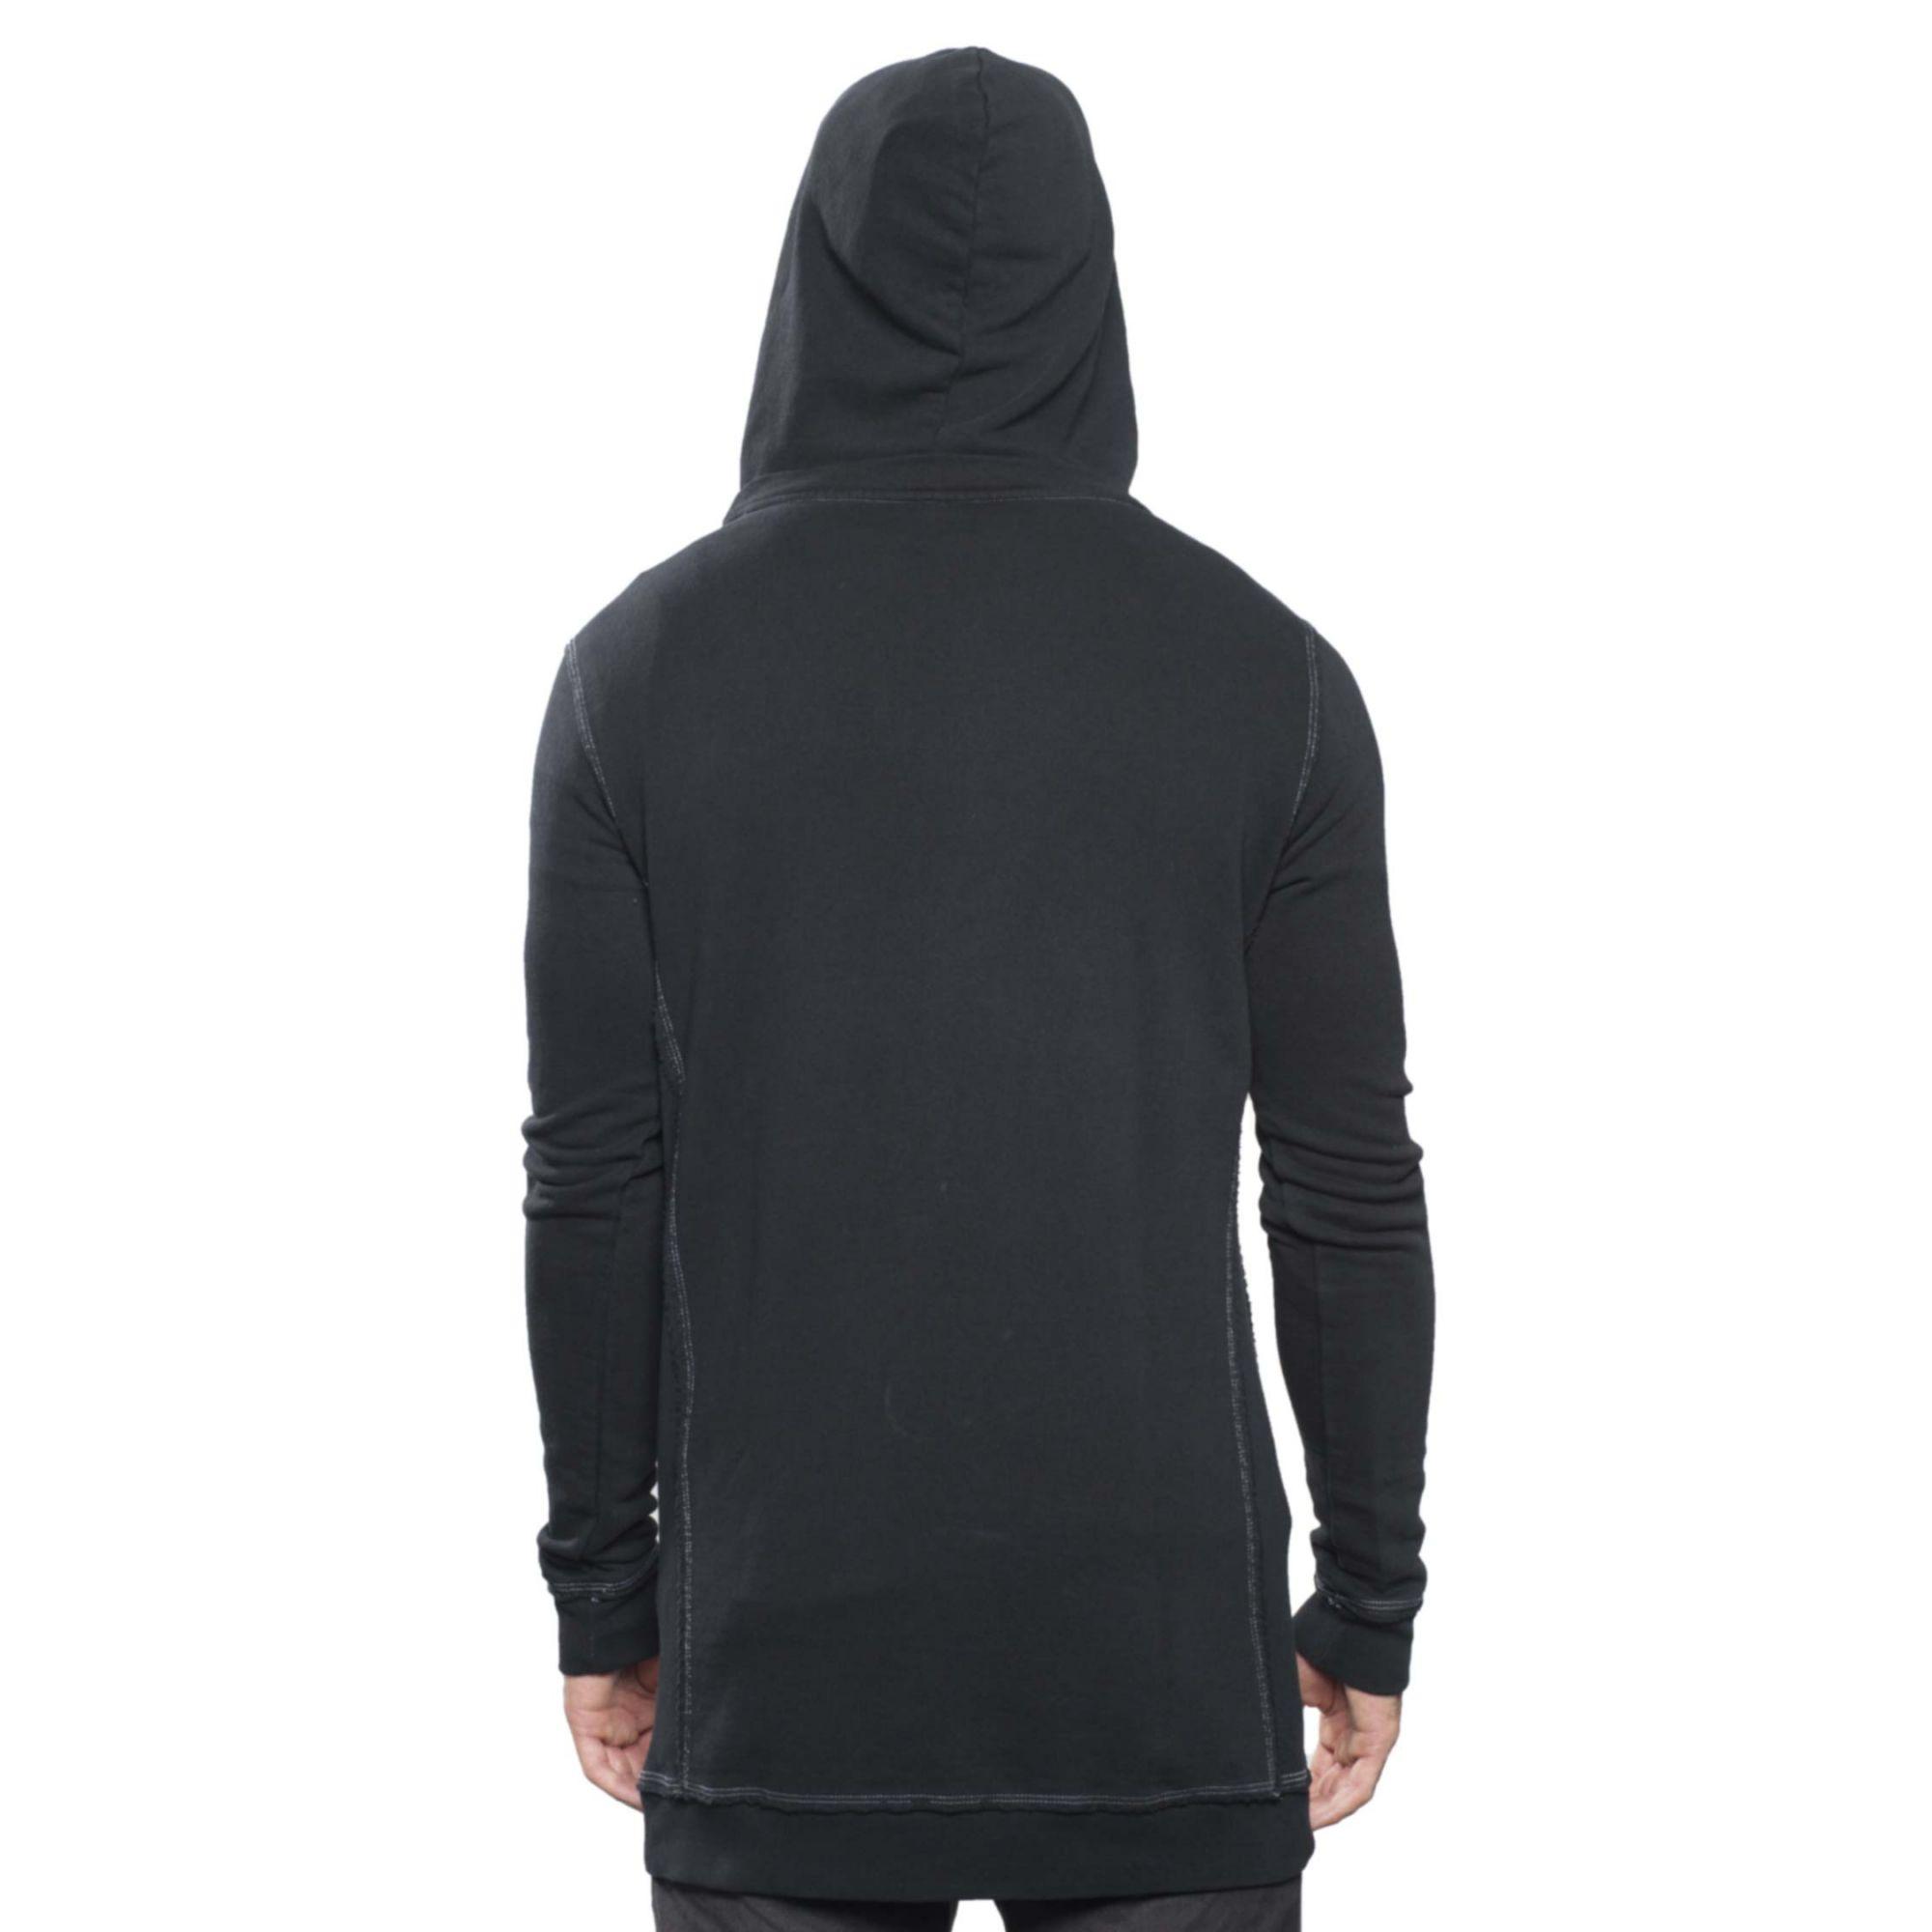 Moletom Buh Contraste Black